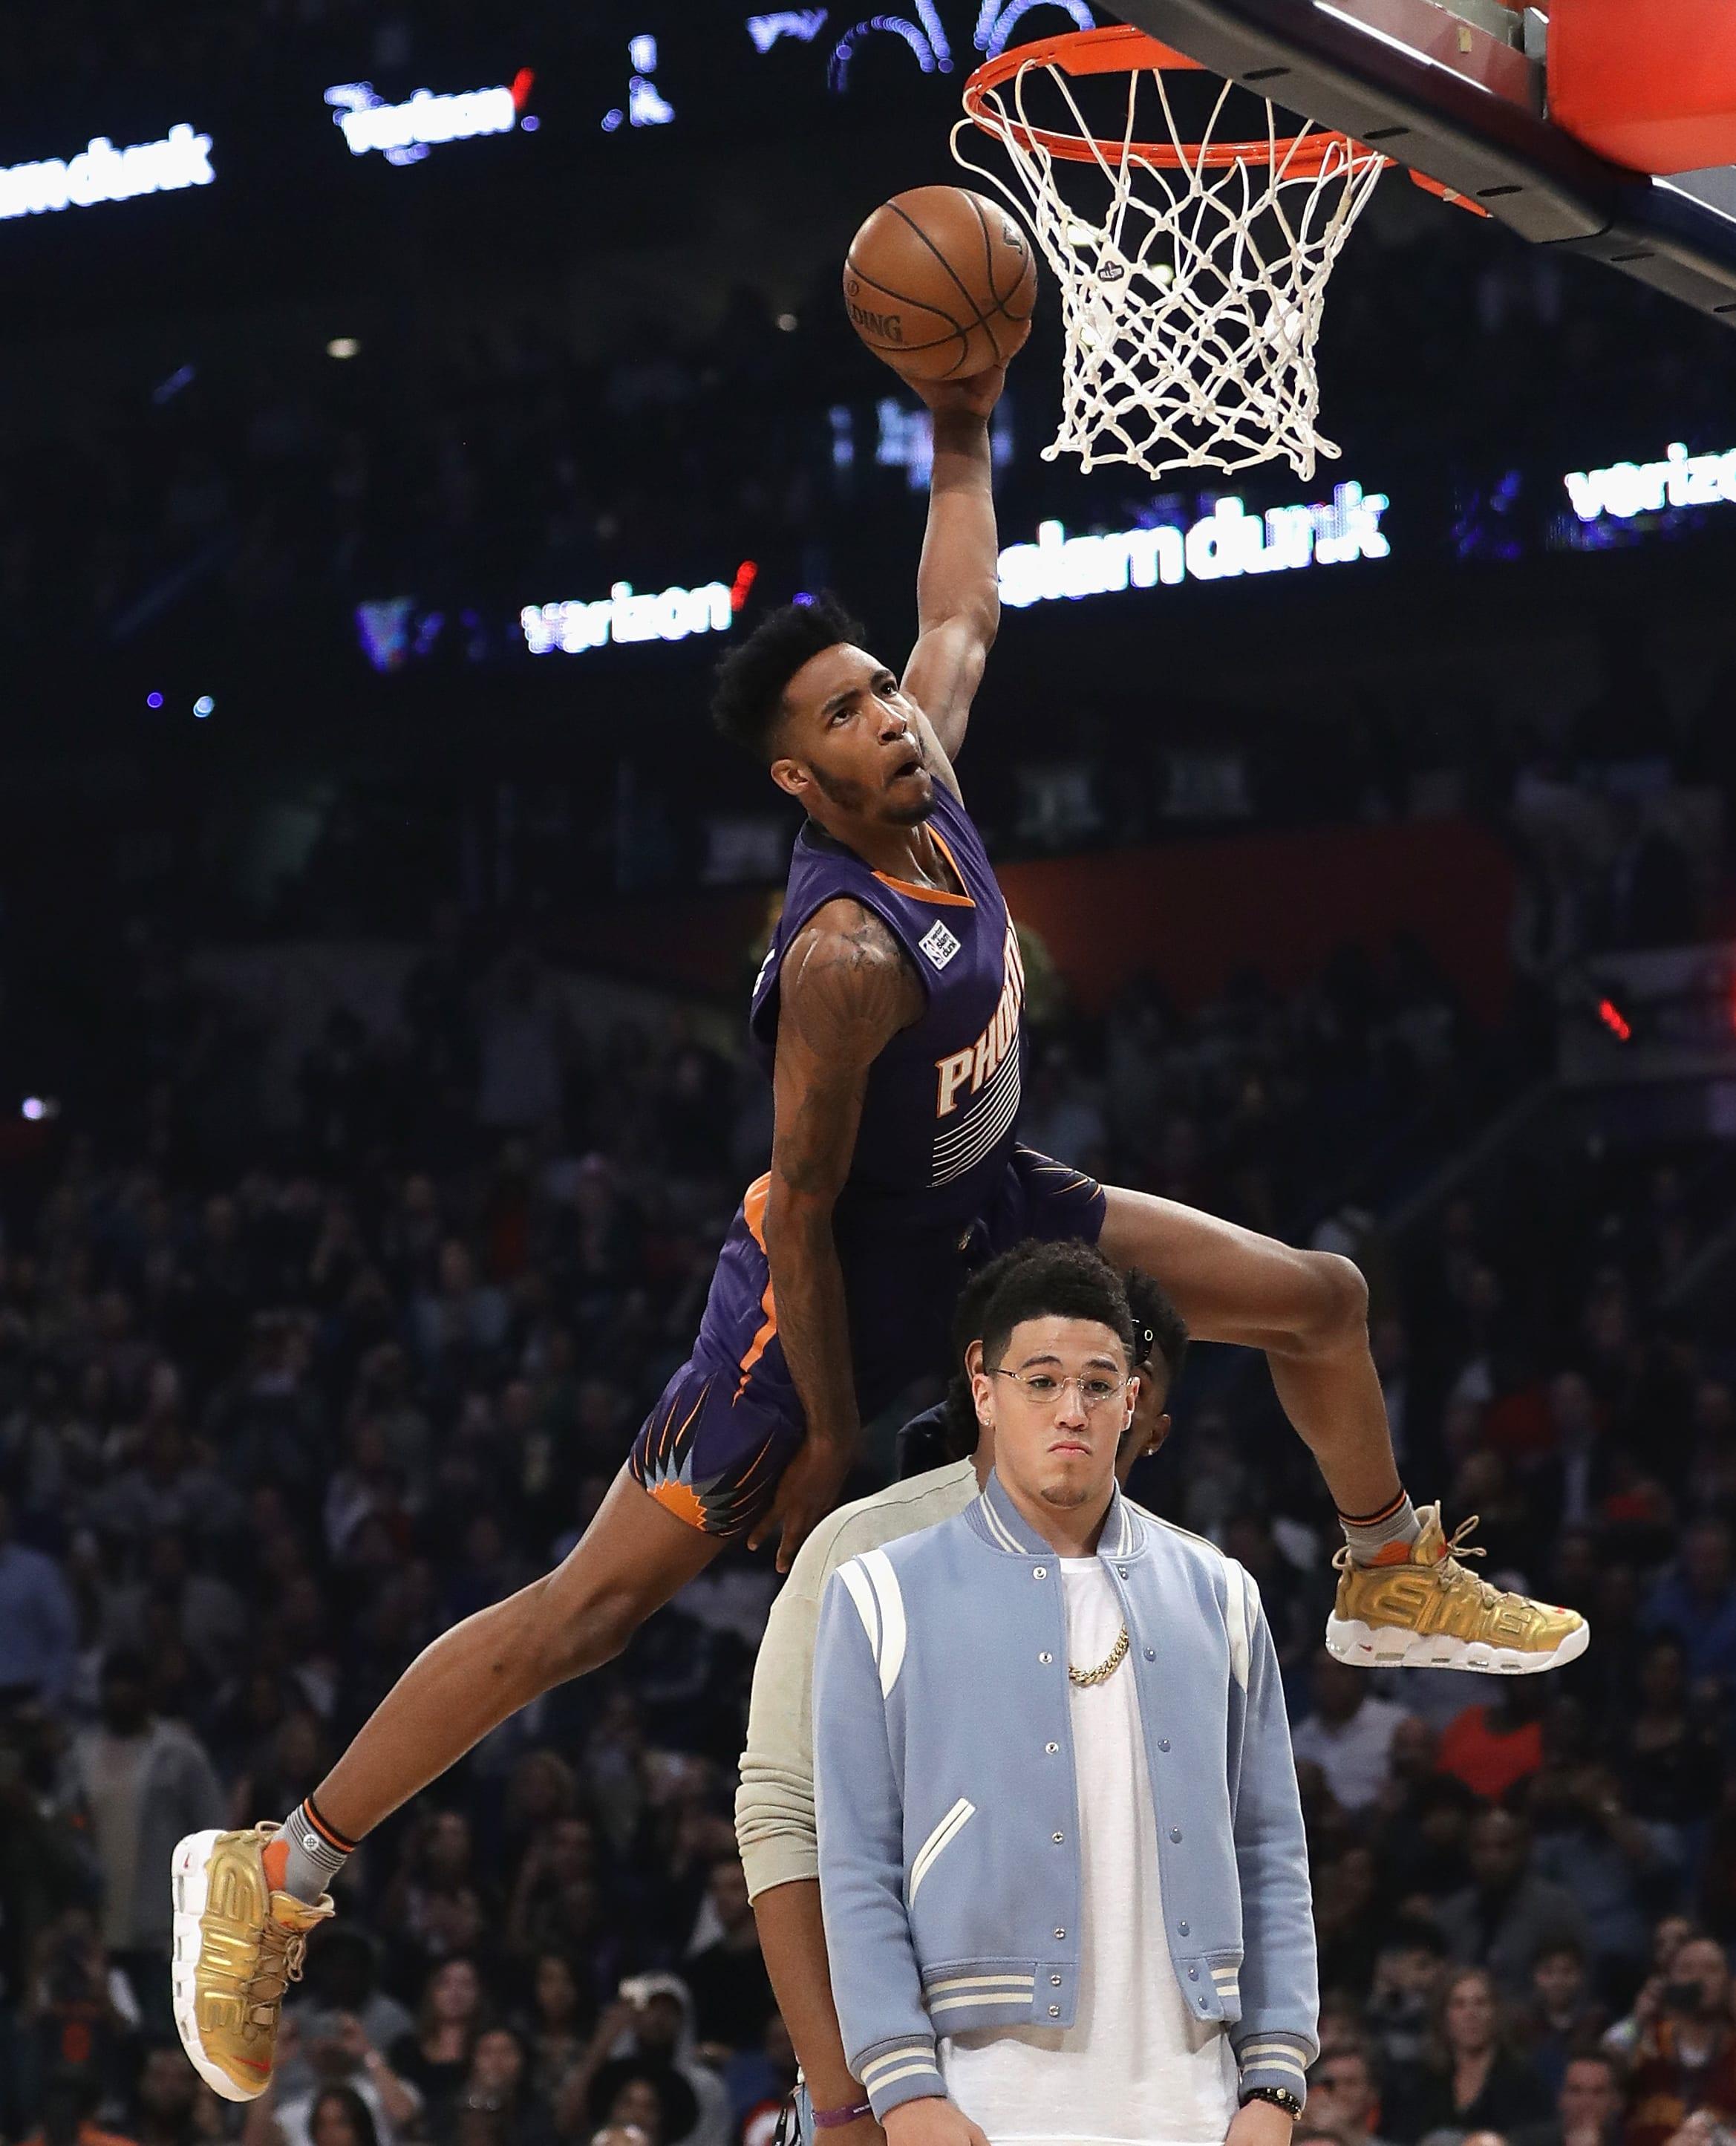 Derrick Jones Jr. Nike Air More Uptempo Supreme Gold